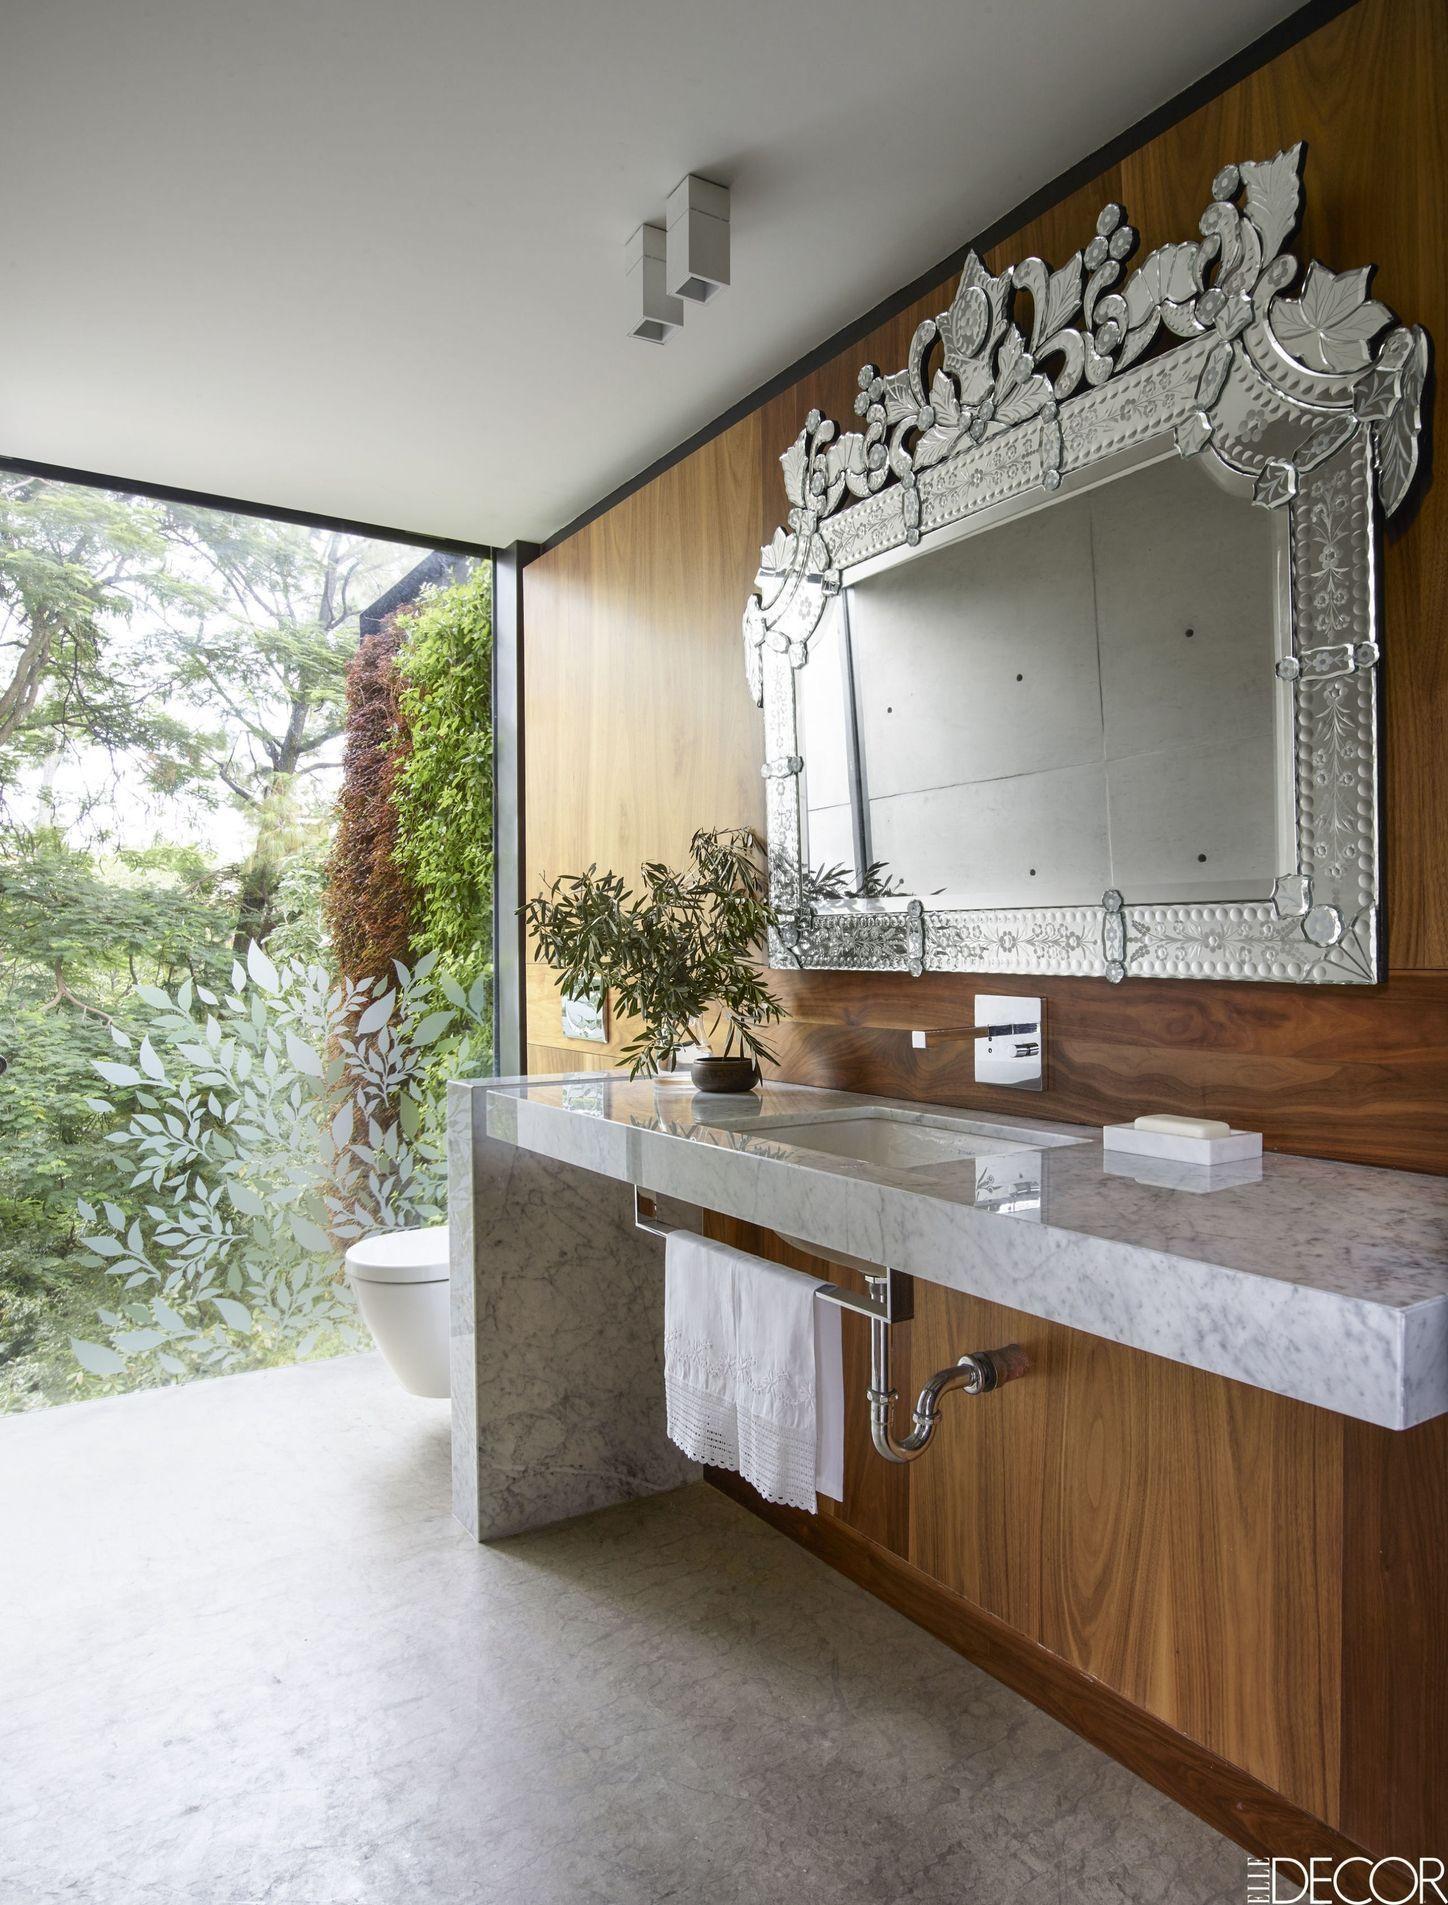 100 Beautiful Bathrooms Ideas & Pictures - Bathroom Design ... on Beautiful Bathroom Ideas  id=85325